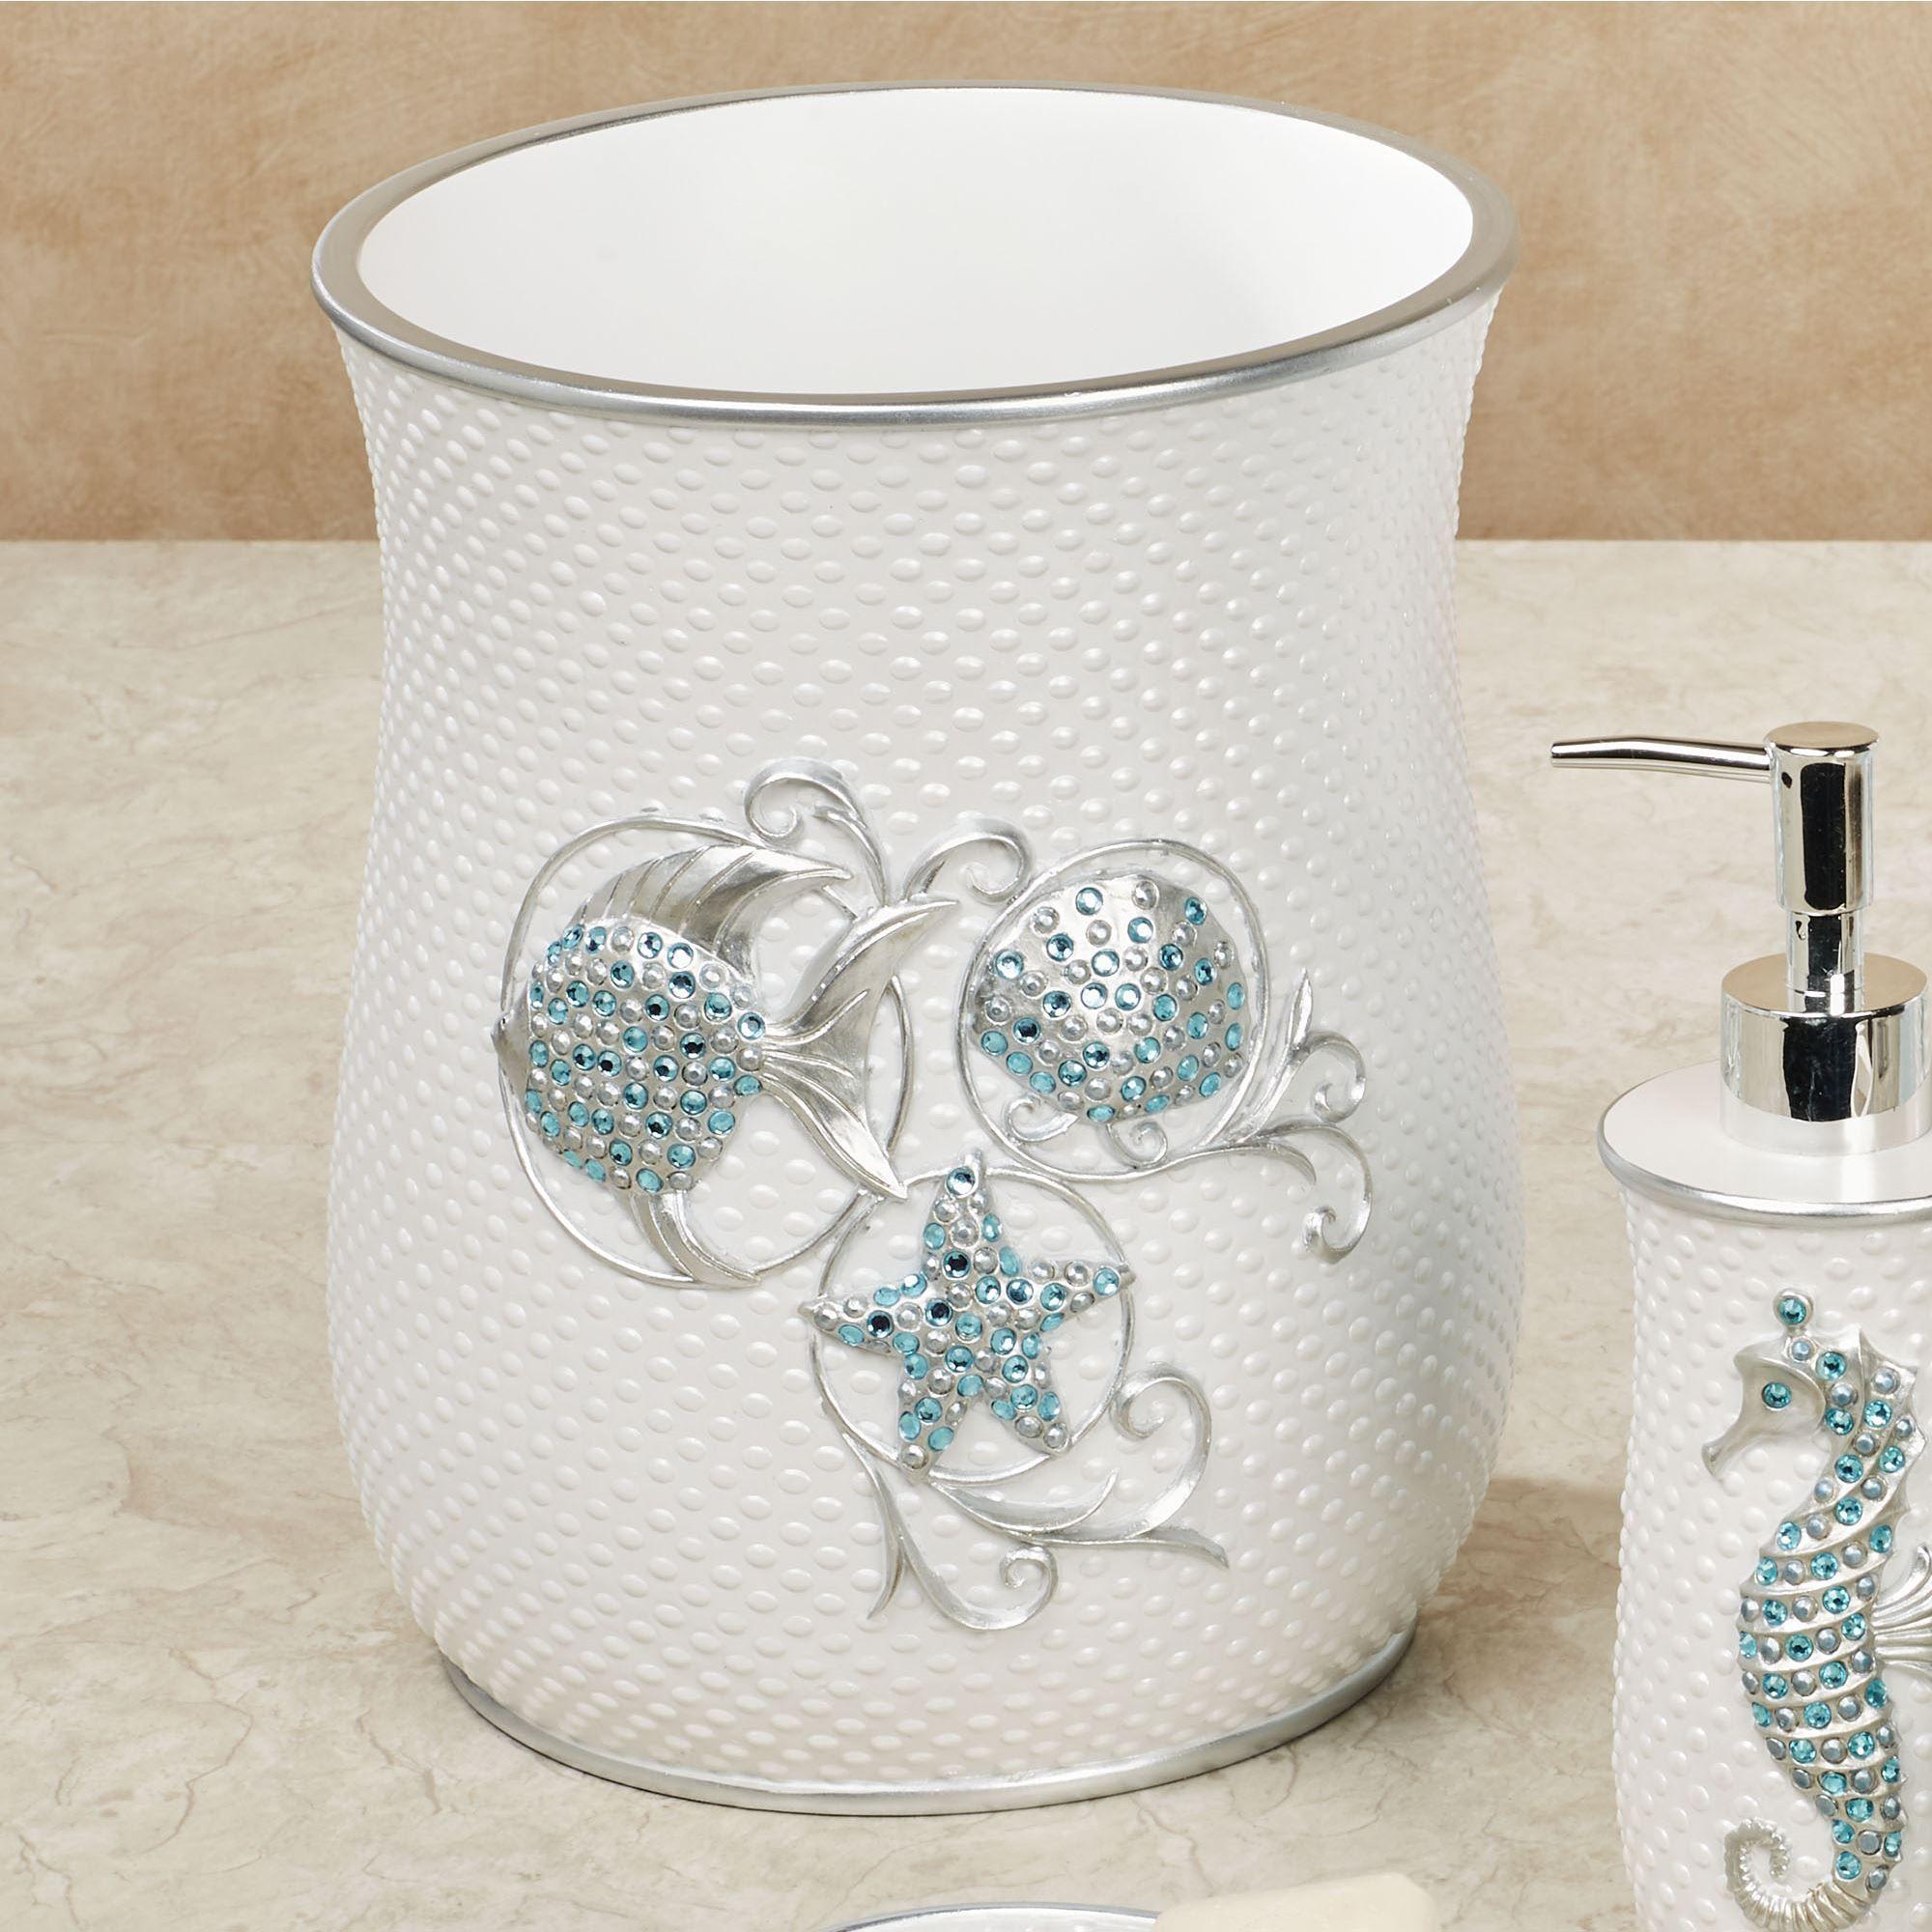 Watermark Gem Coastal Bath Accessories